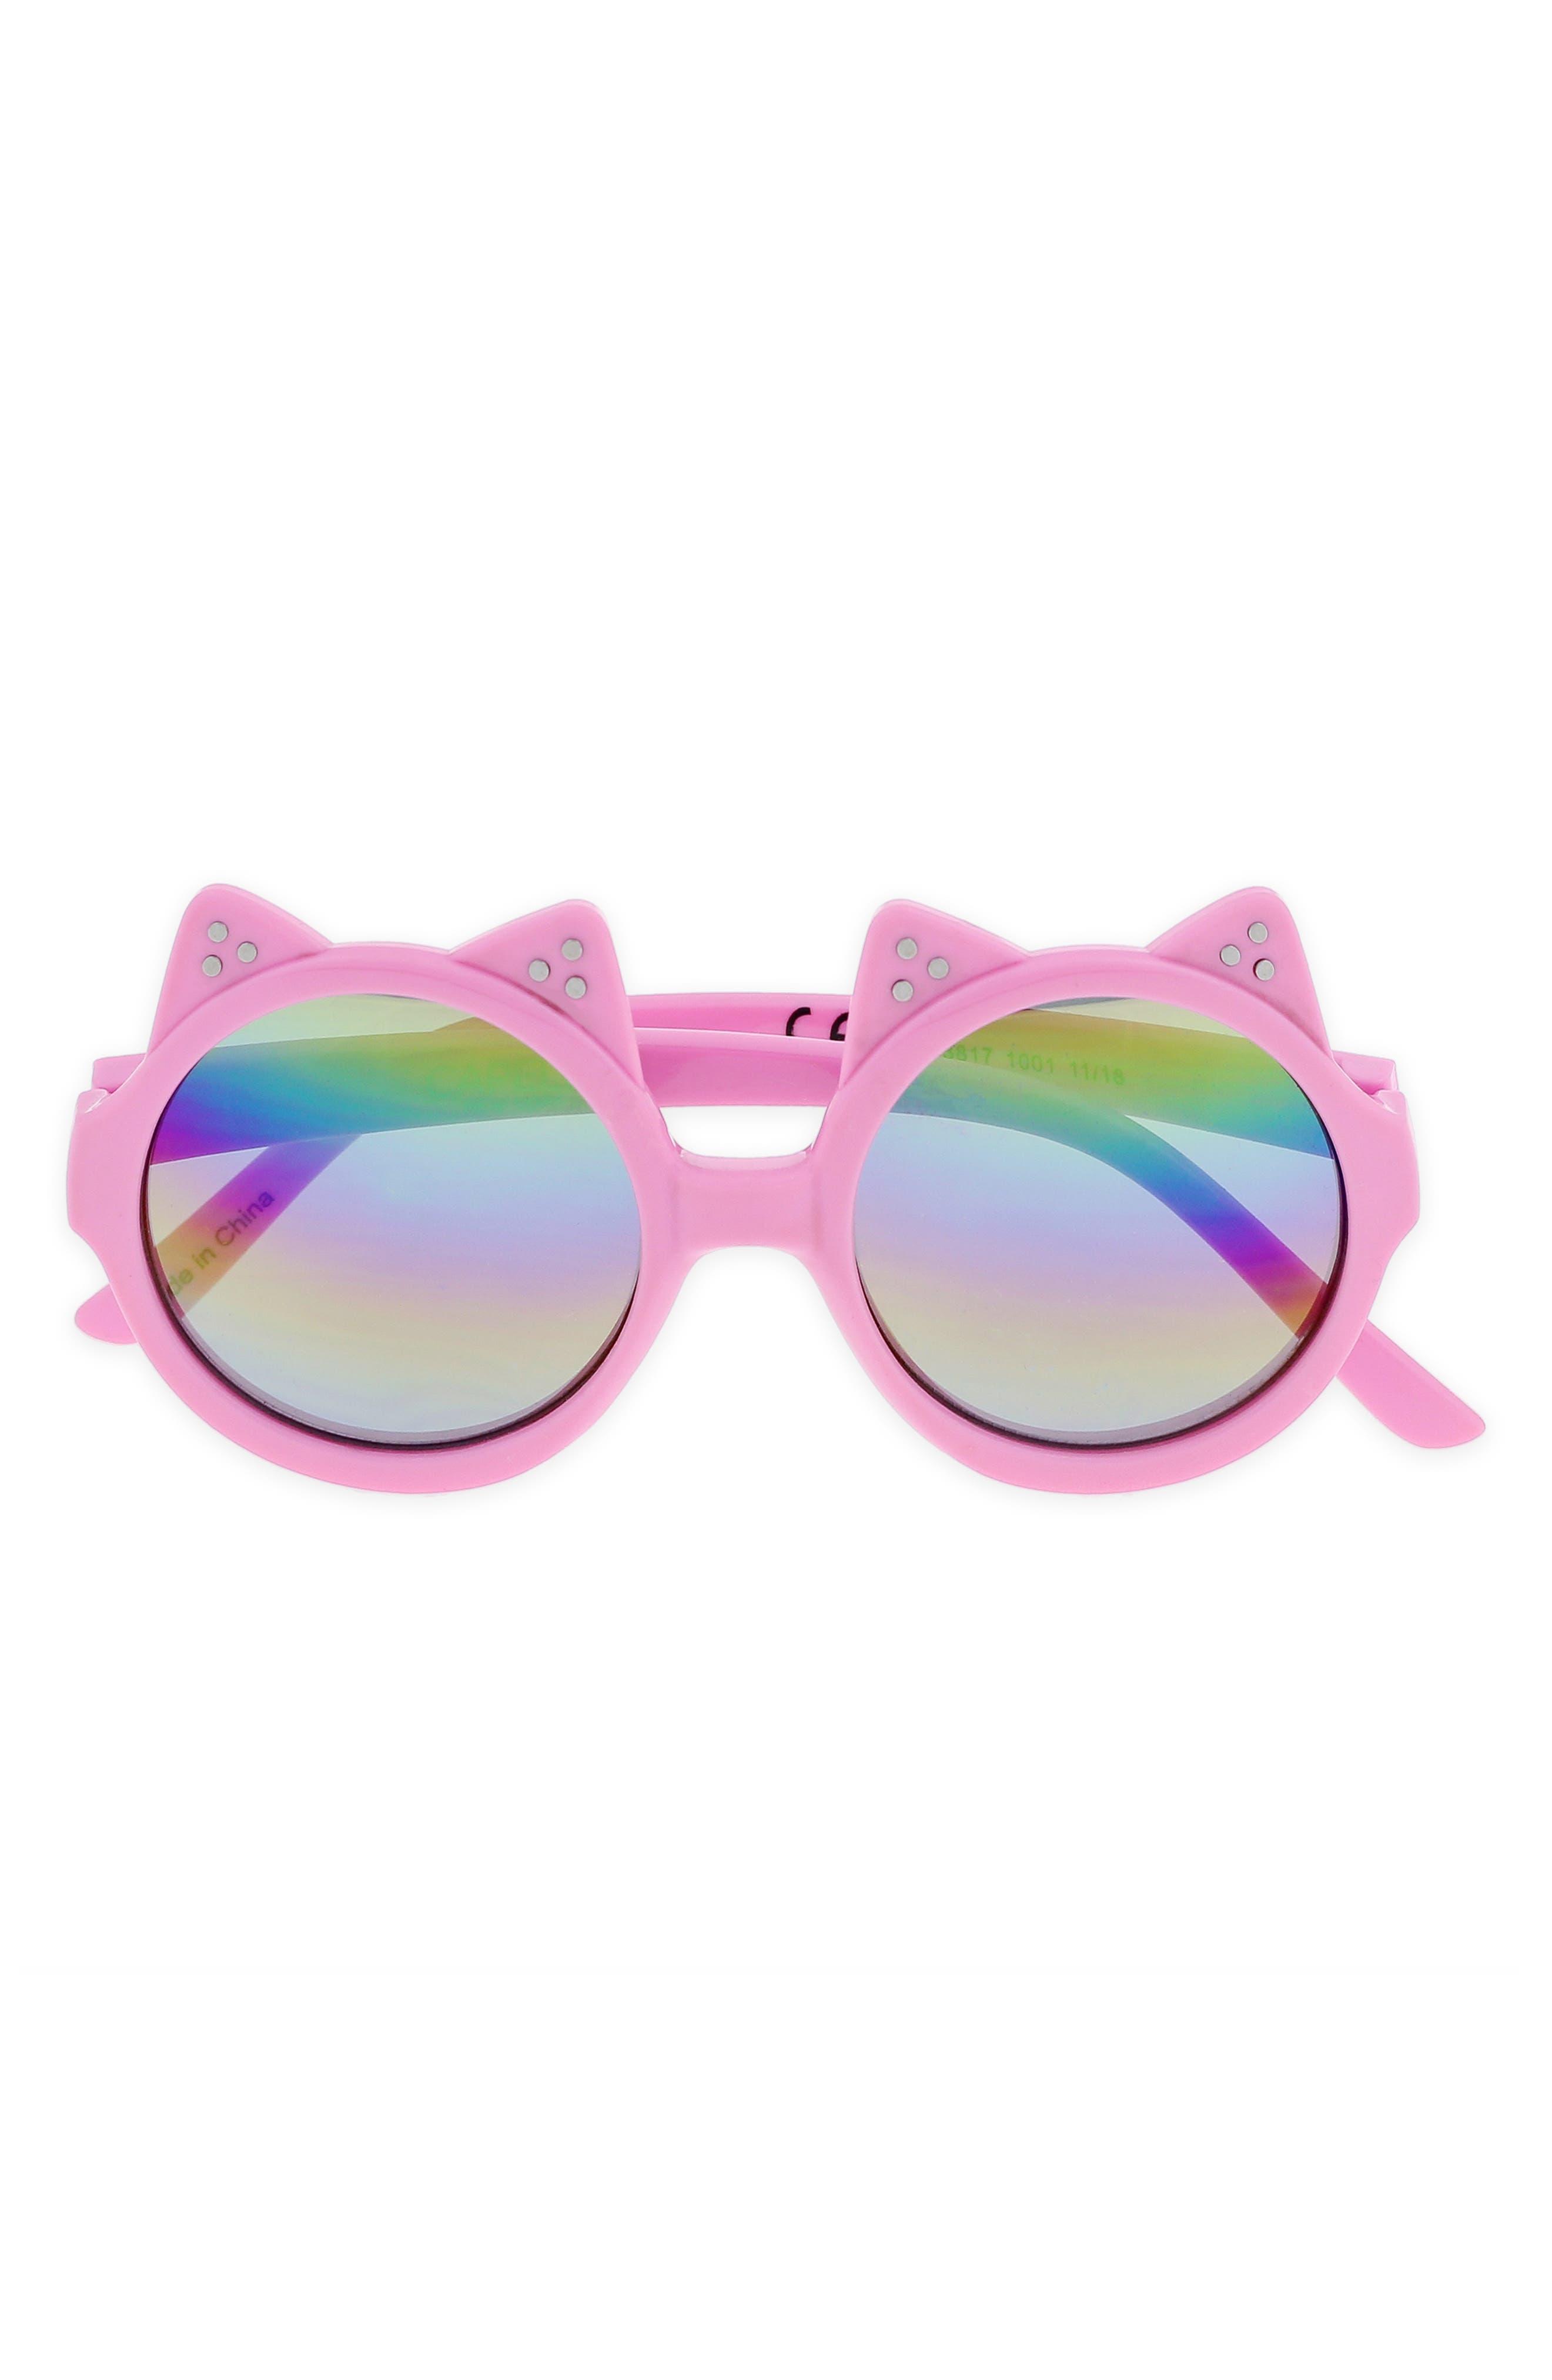 CAPELLI NEW YORK, Rainbow Lens Cat Ear Round Sunglasses, Main thumbnail 1, color, MULTI COMBO